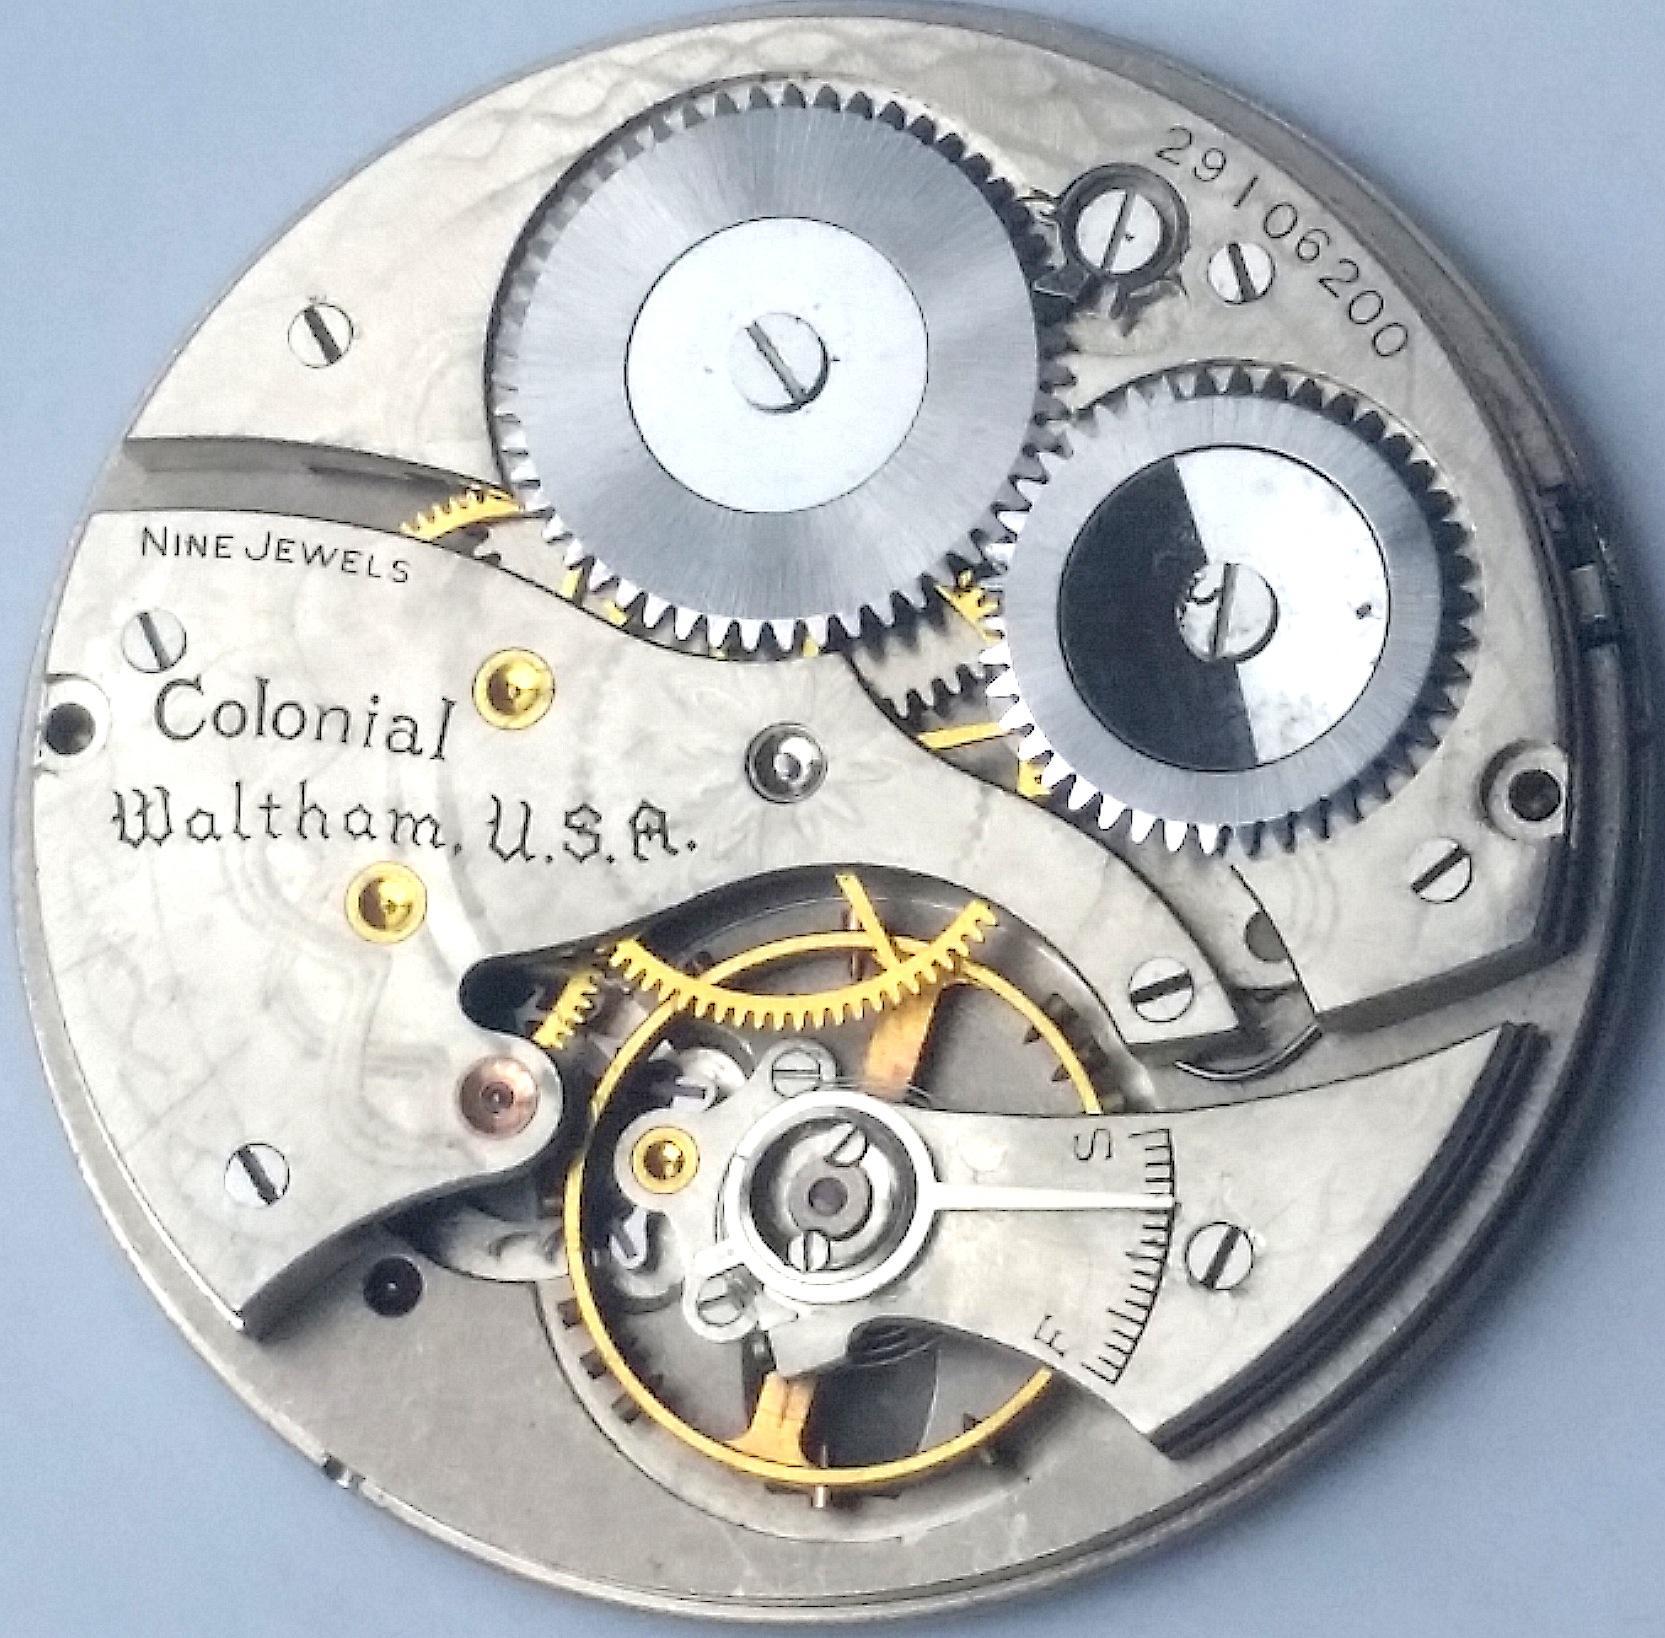 Waltham Colonial Pocket Watch 9 Jewel Movement Ca 1935